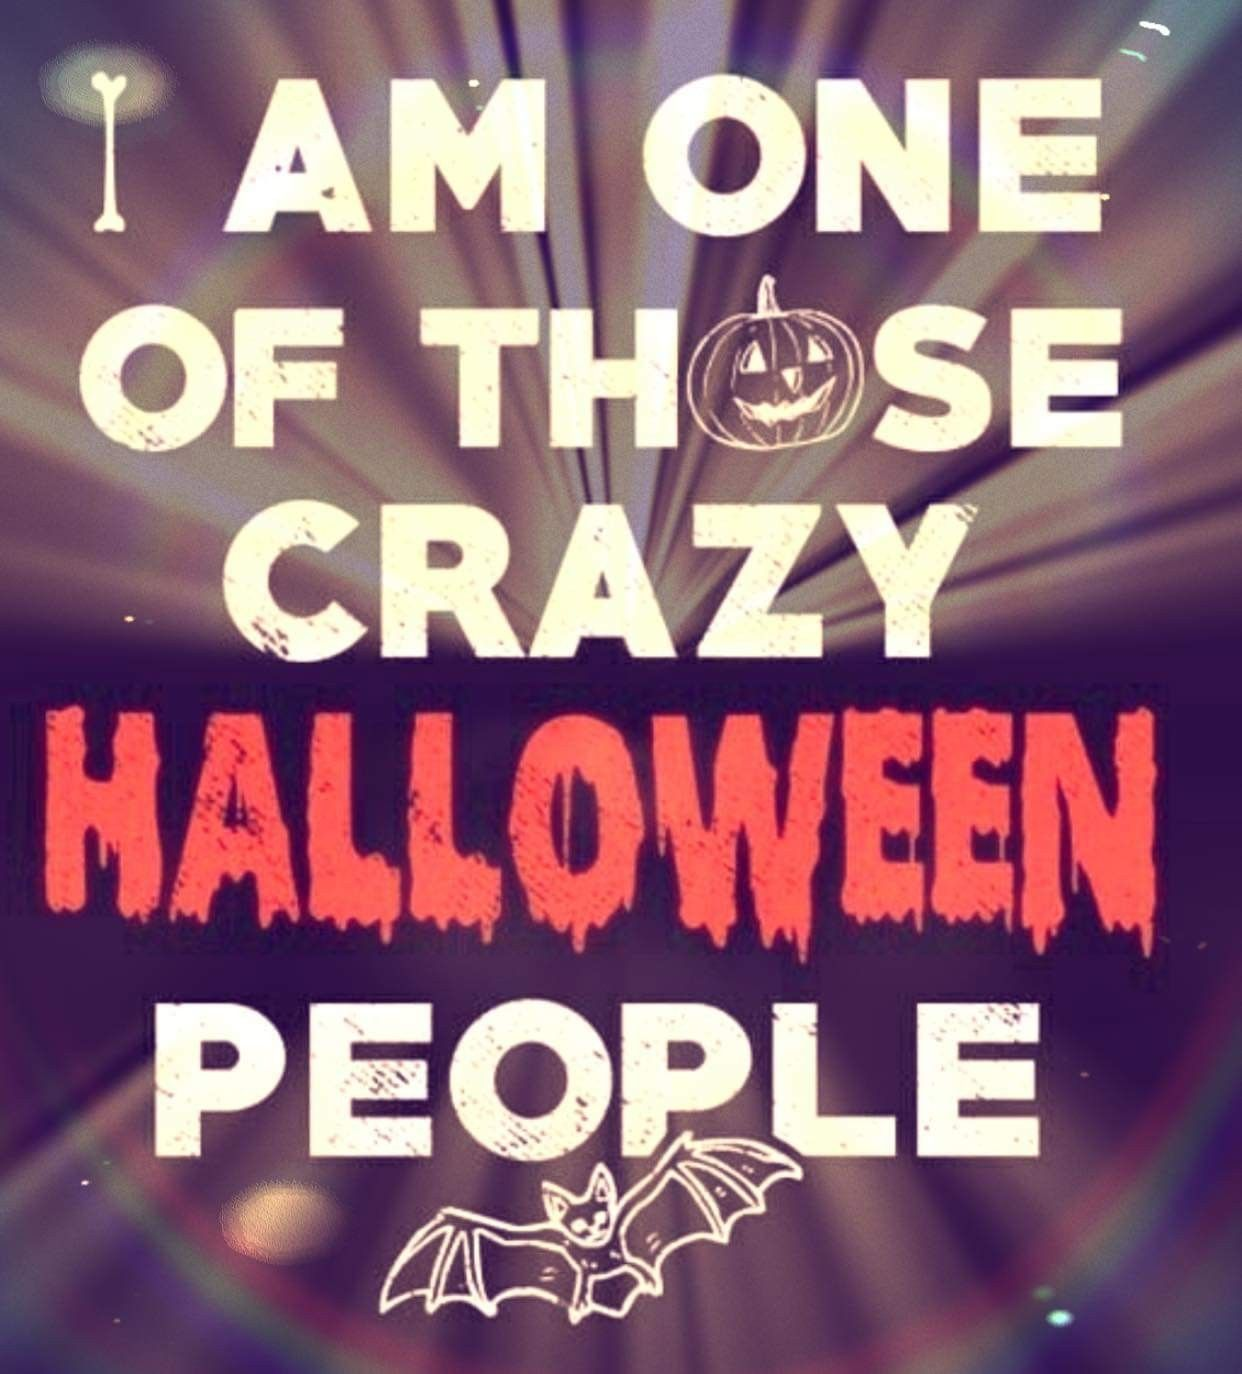 Pin By Spookycatlady On Halloween Samhain All Hallow S Eve Happy Halloween Funny Halloween Funny Halloween Countdown